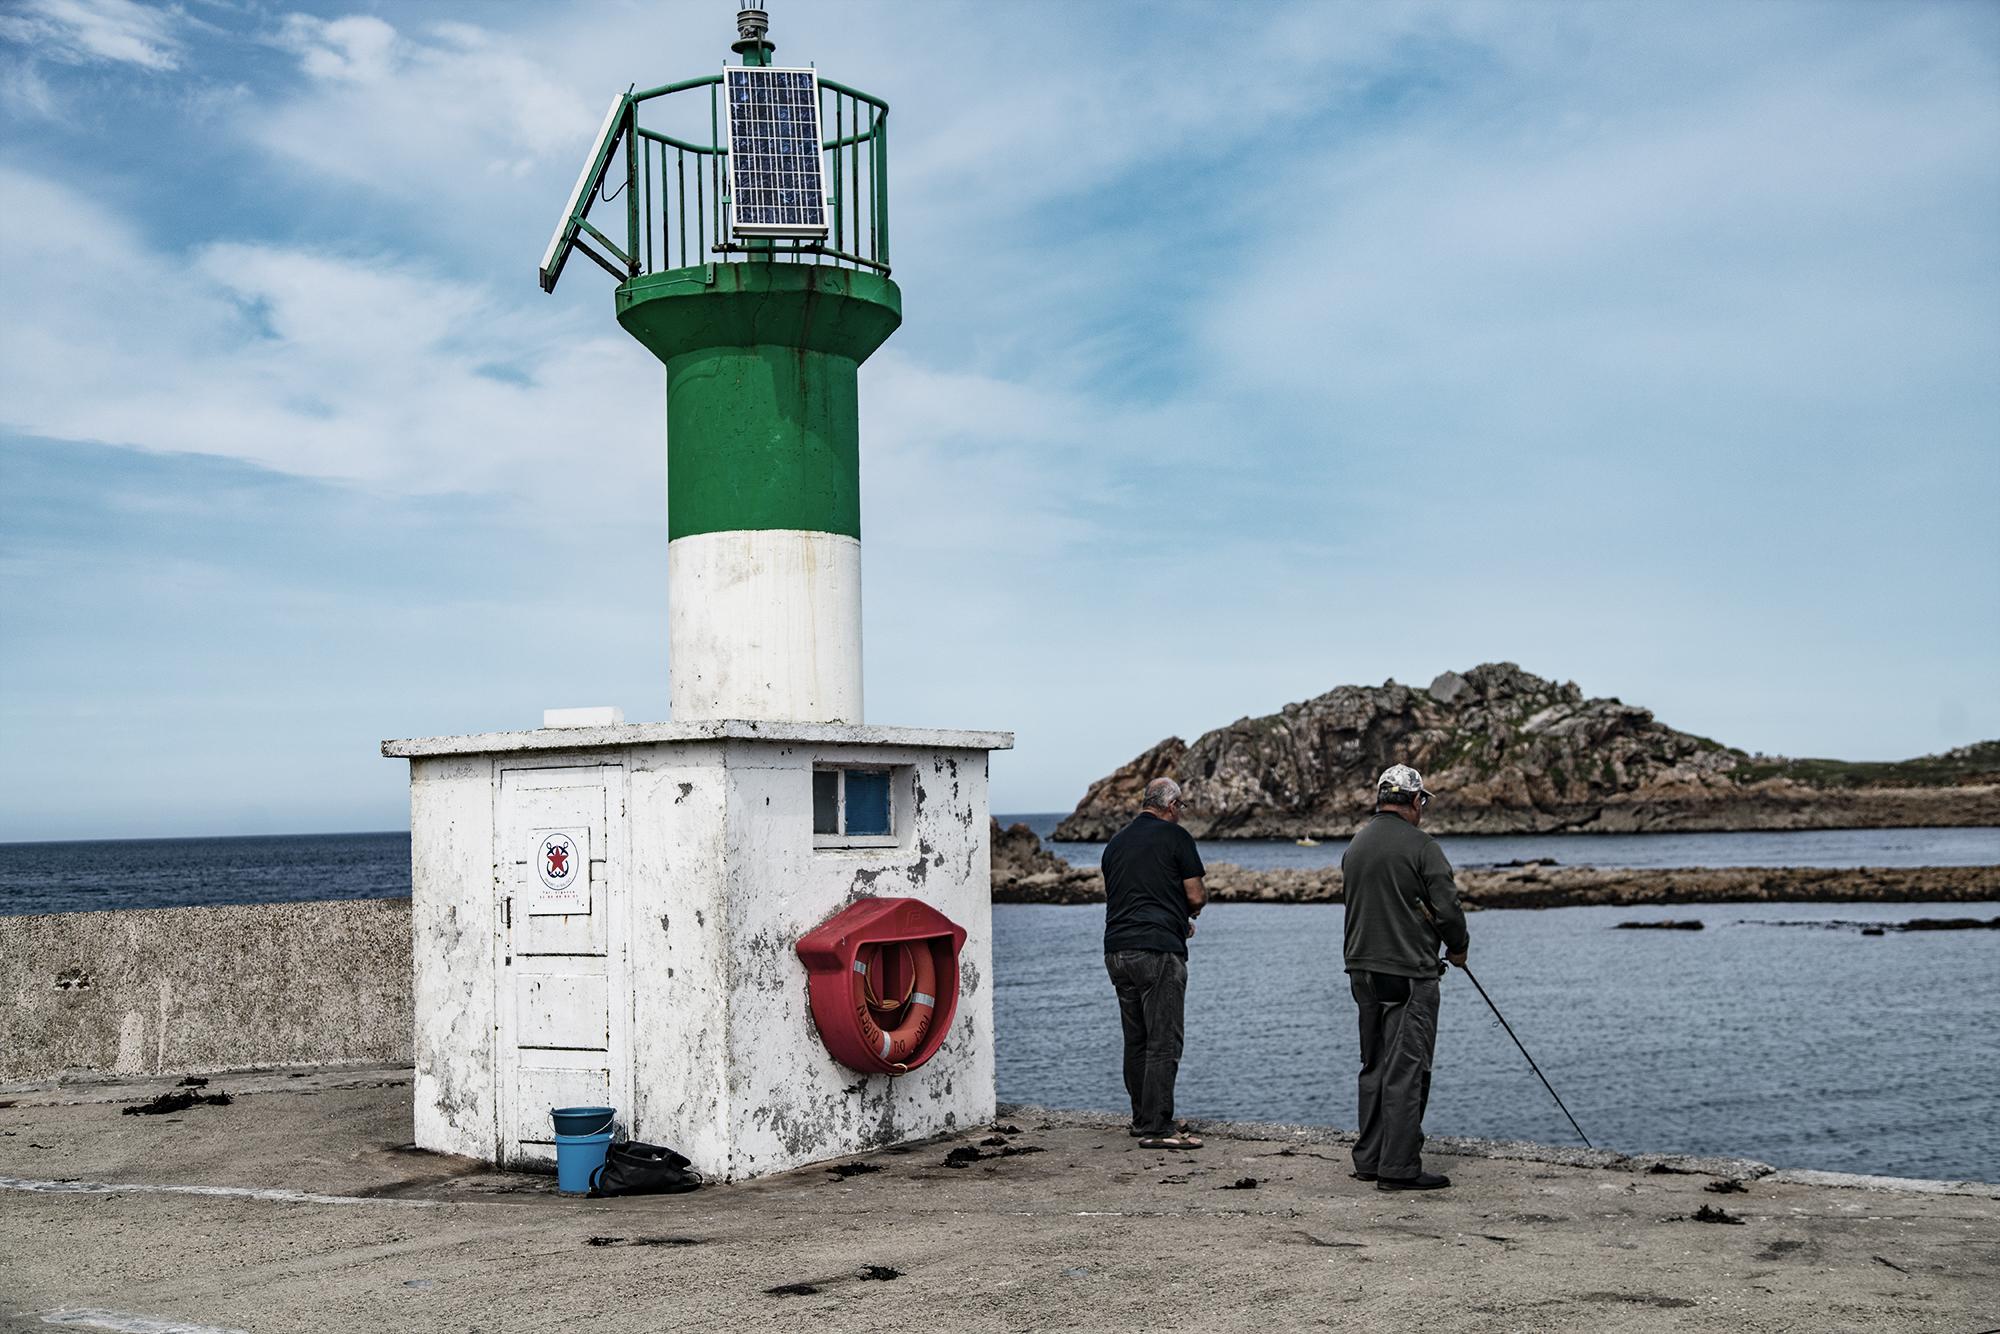 Brittany_Old_Men_Fishing_On_Pier_2017-003.jpg